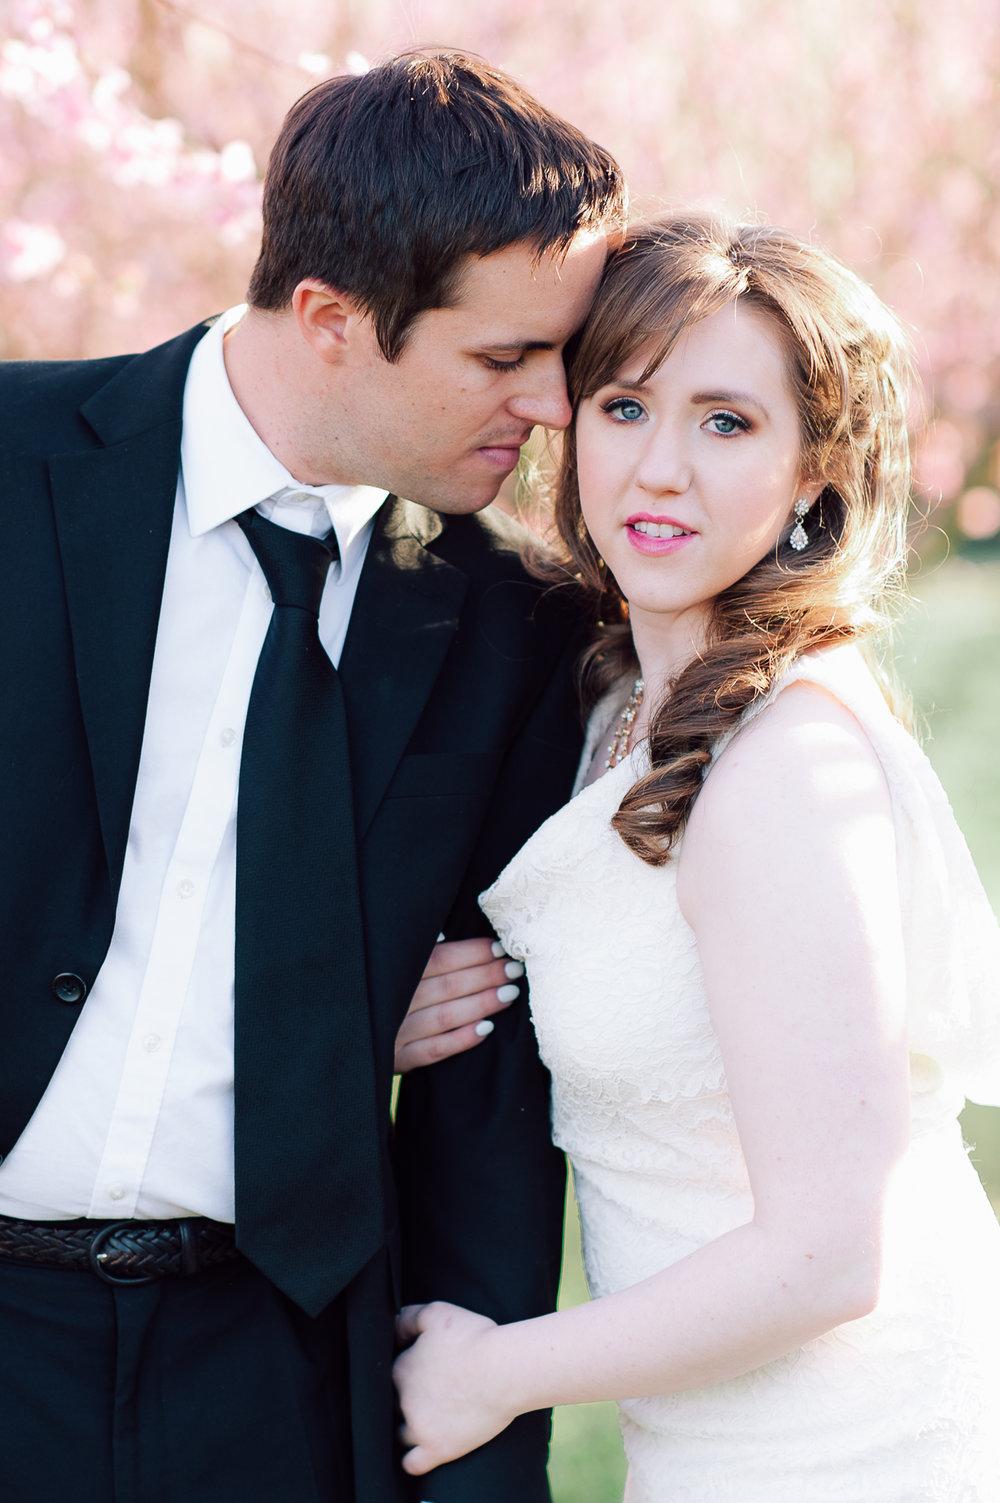 springwedding_cherryblossoms_virginiaphotographer_youseephotography_styledshoot (561).jpg